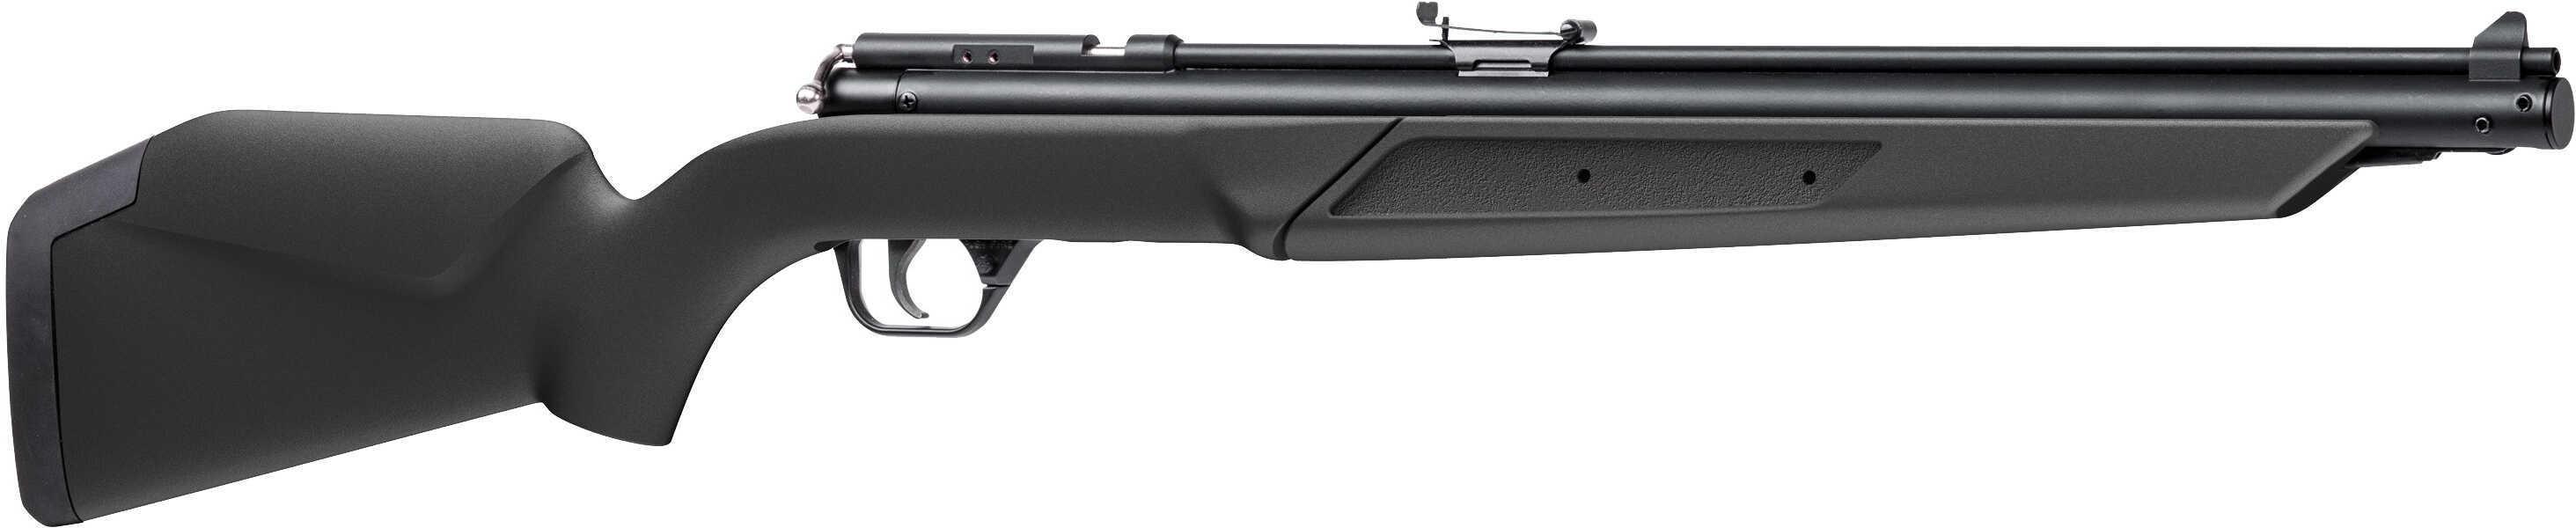 Ben 392S Bolt Action 177Cal Air Rifle